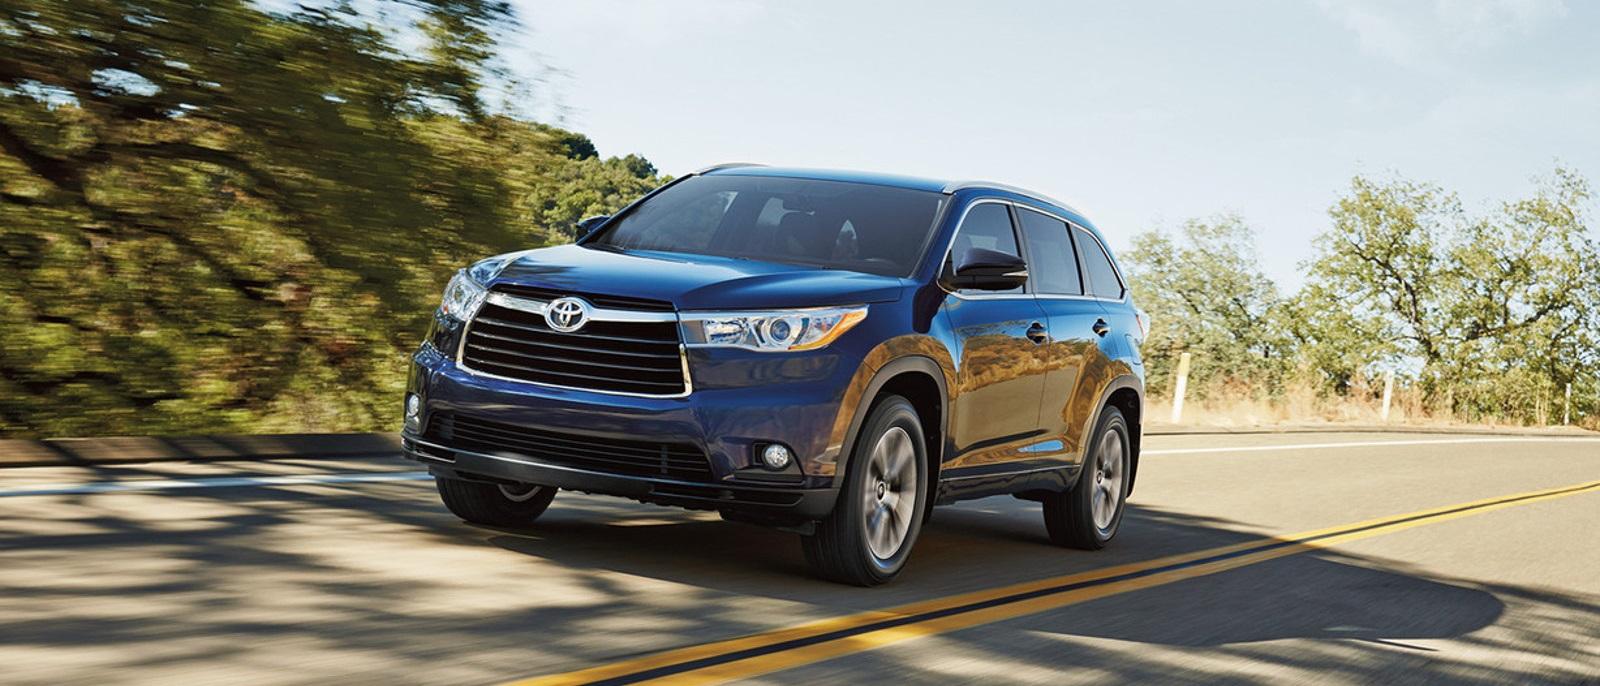 2016 Toyota Highlander driving